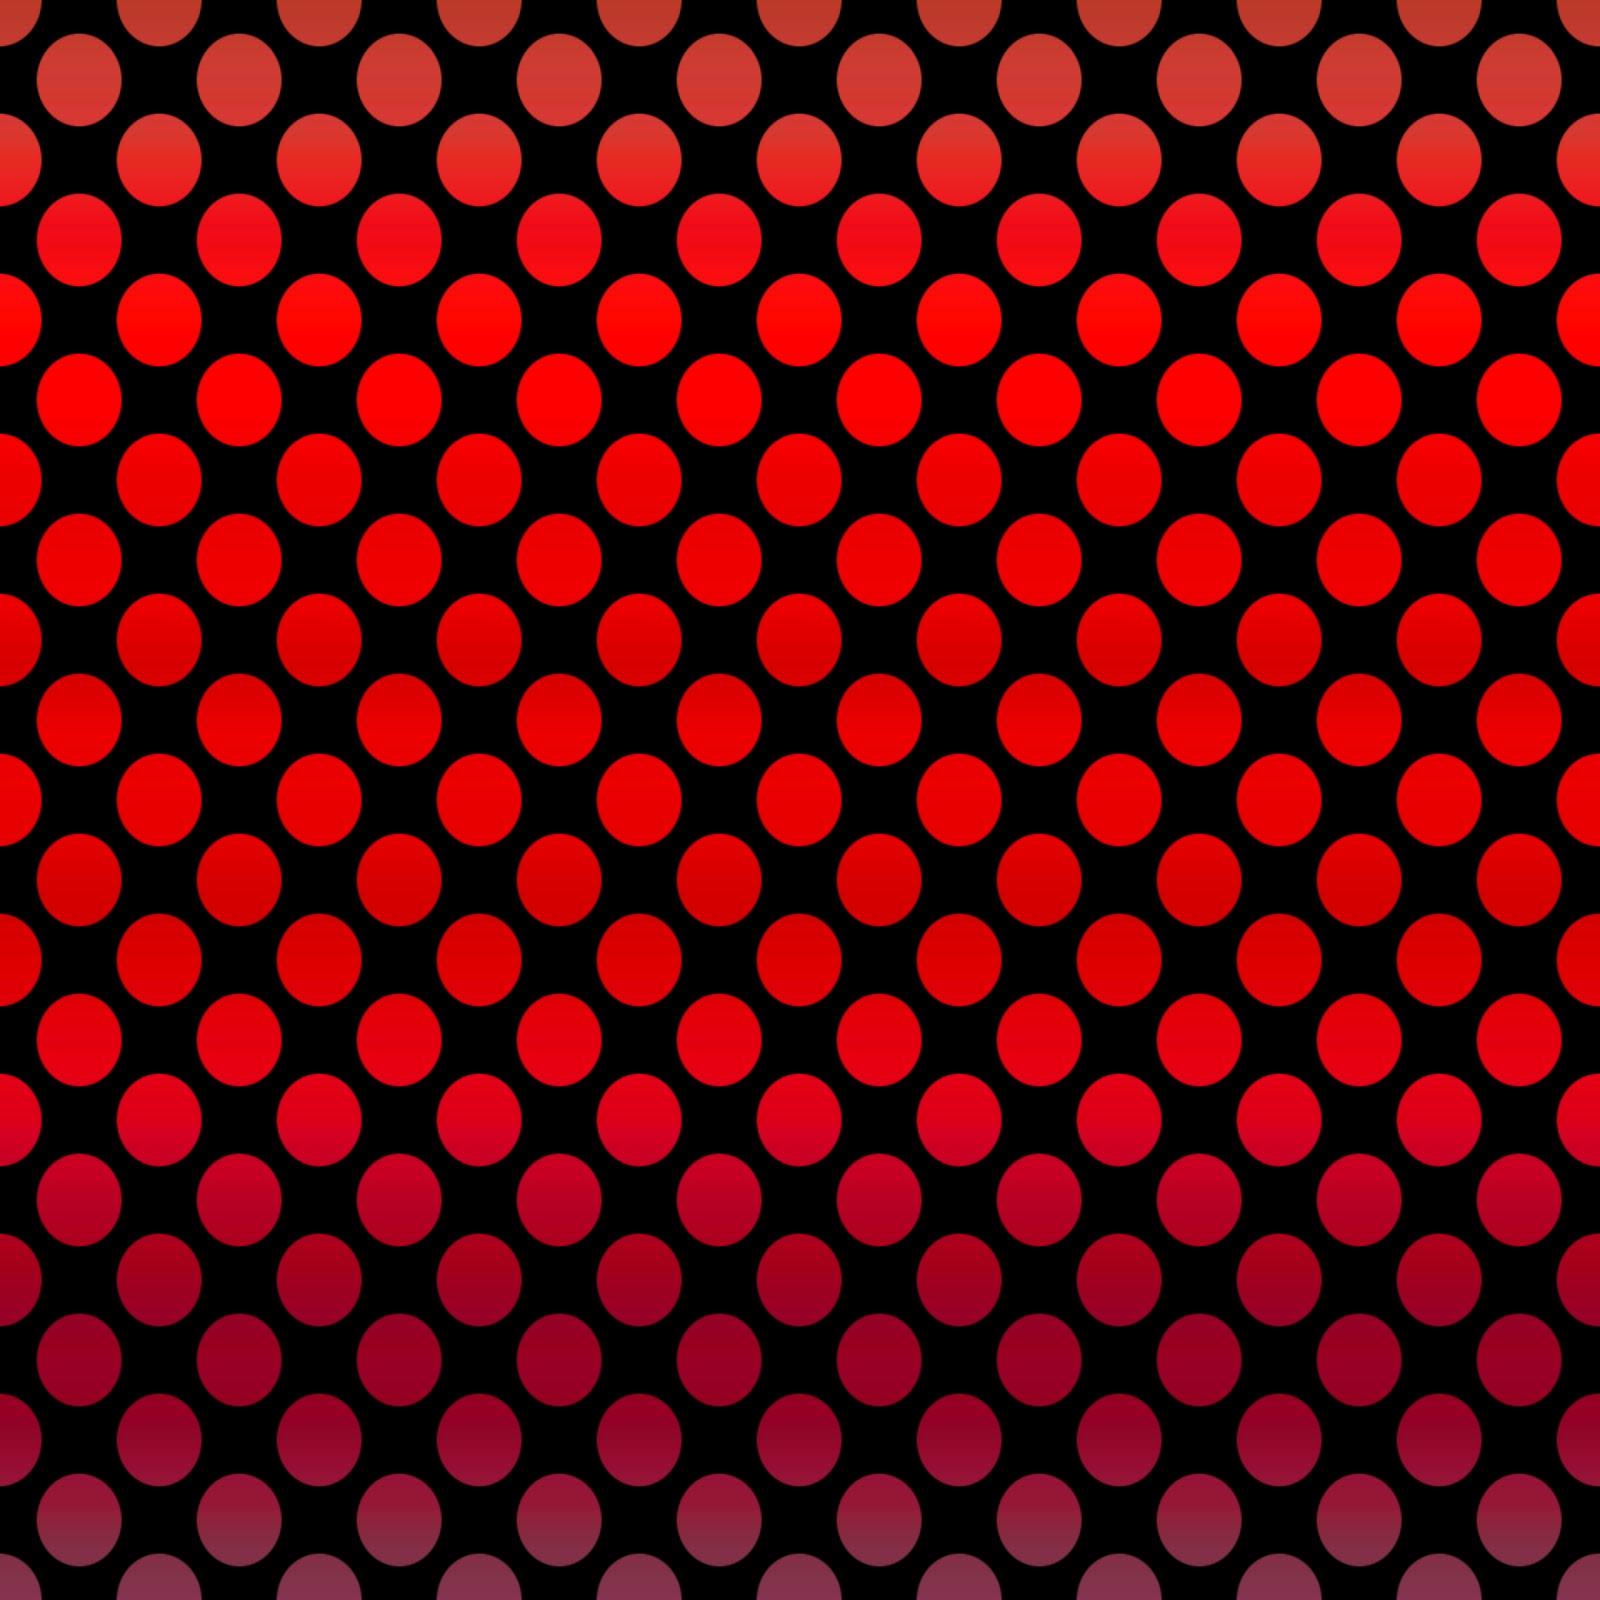 Best Wallpaper Halloween Polka Dot - free%2Bdigital%2Bscrapbook%2Bpaper_red%2Bpolka%2Bdots%2Bon%2Bblack%2Bbackground  Perfect Image Reference_608434.jpg